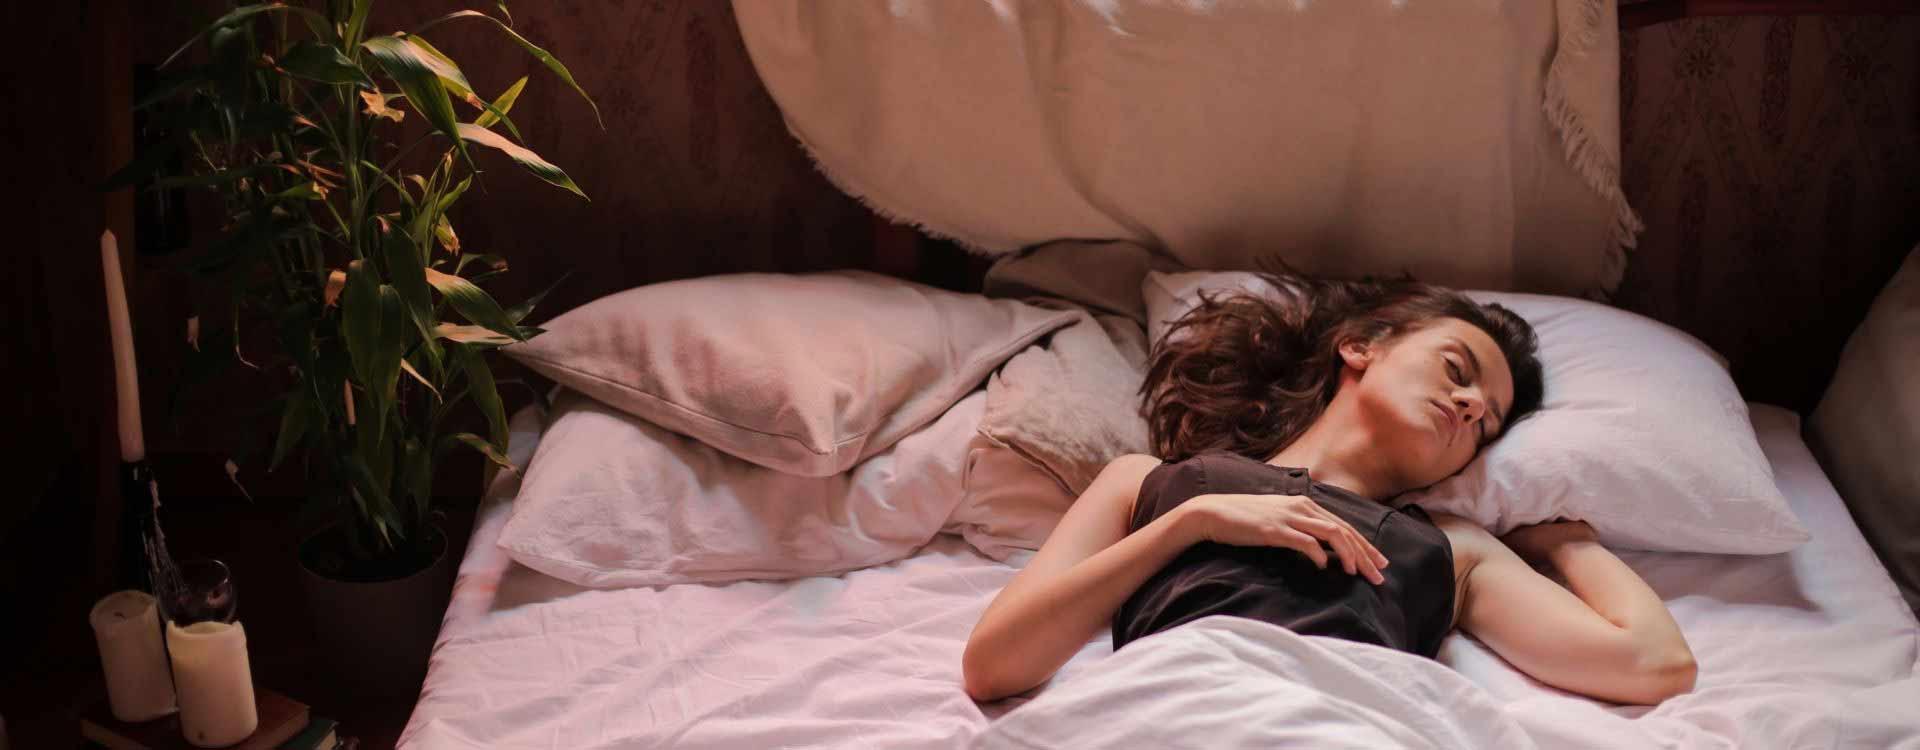 CBD and Sleep: What the Studies Show